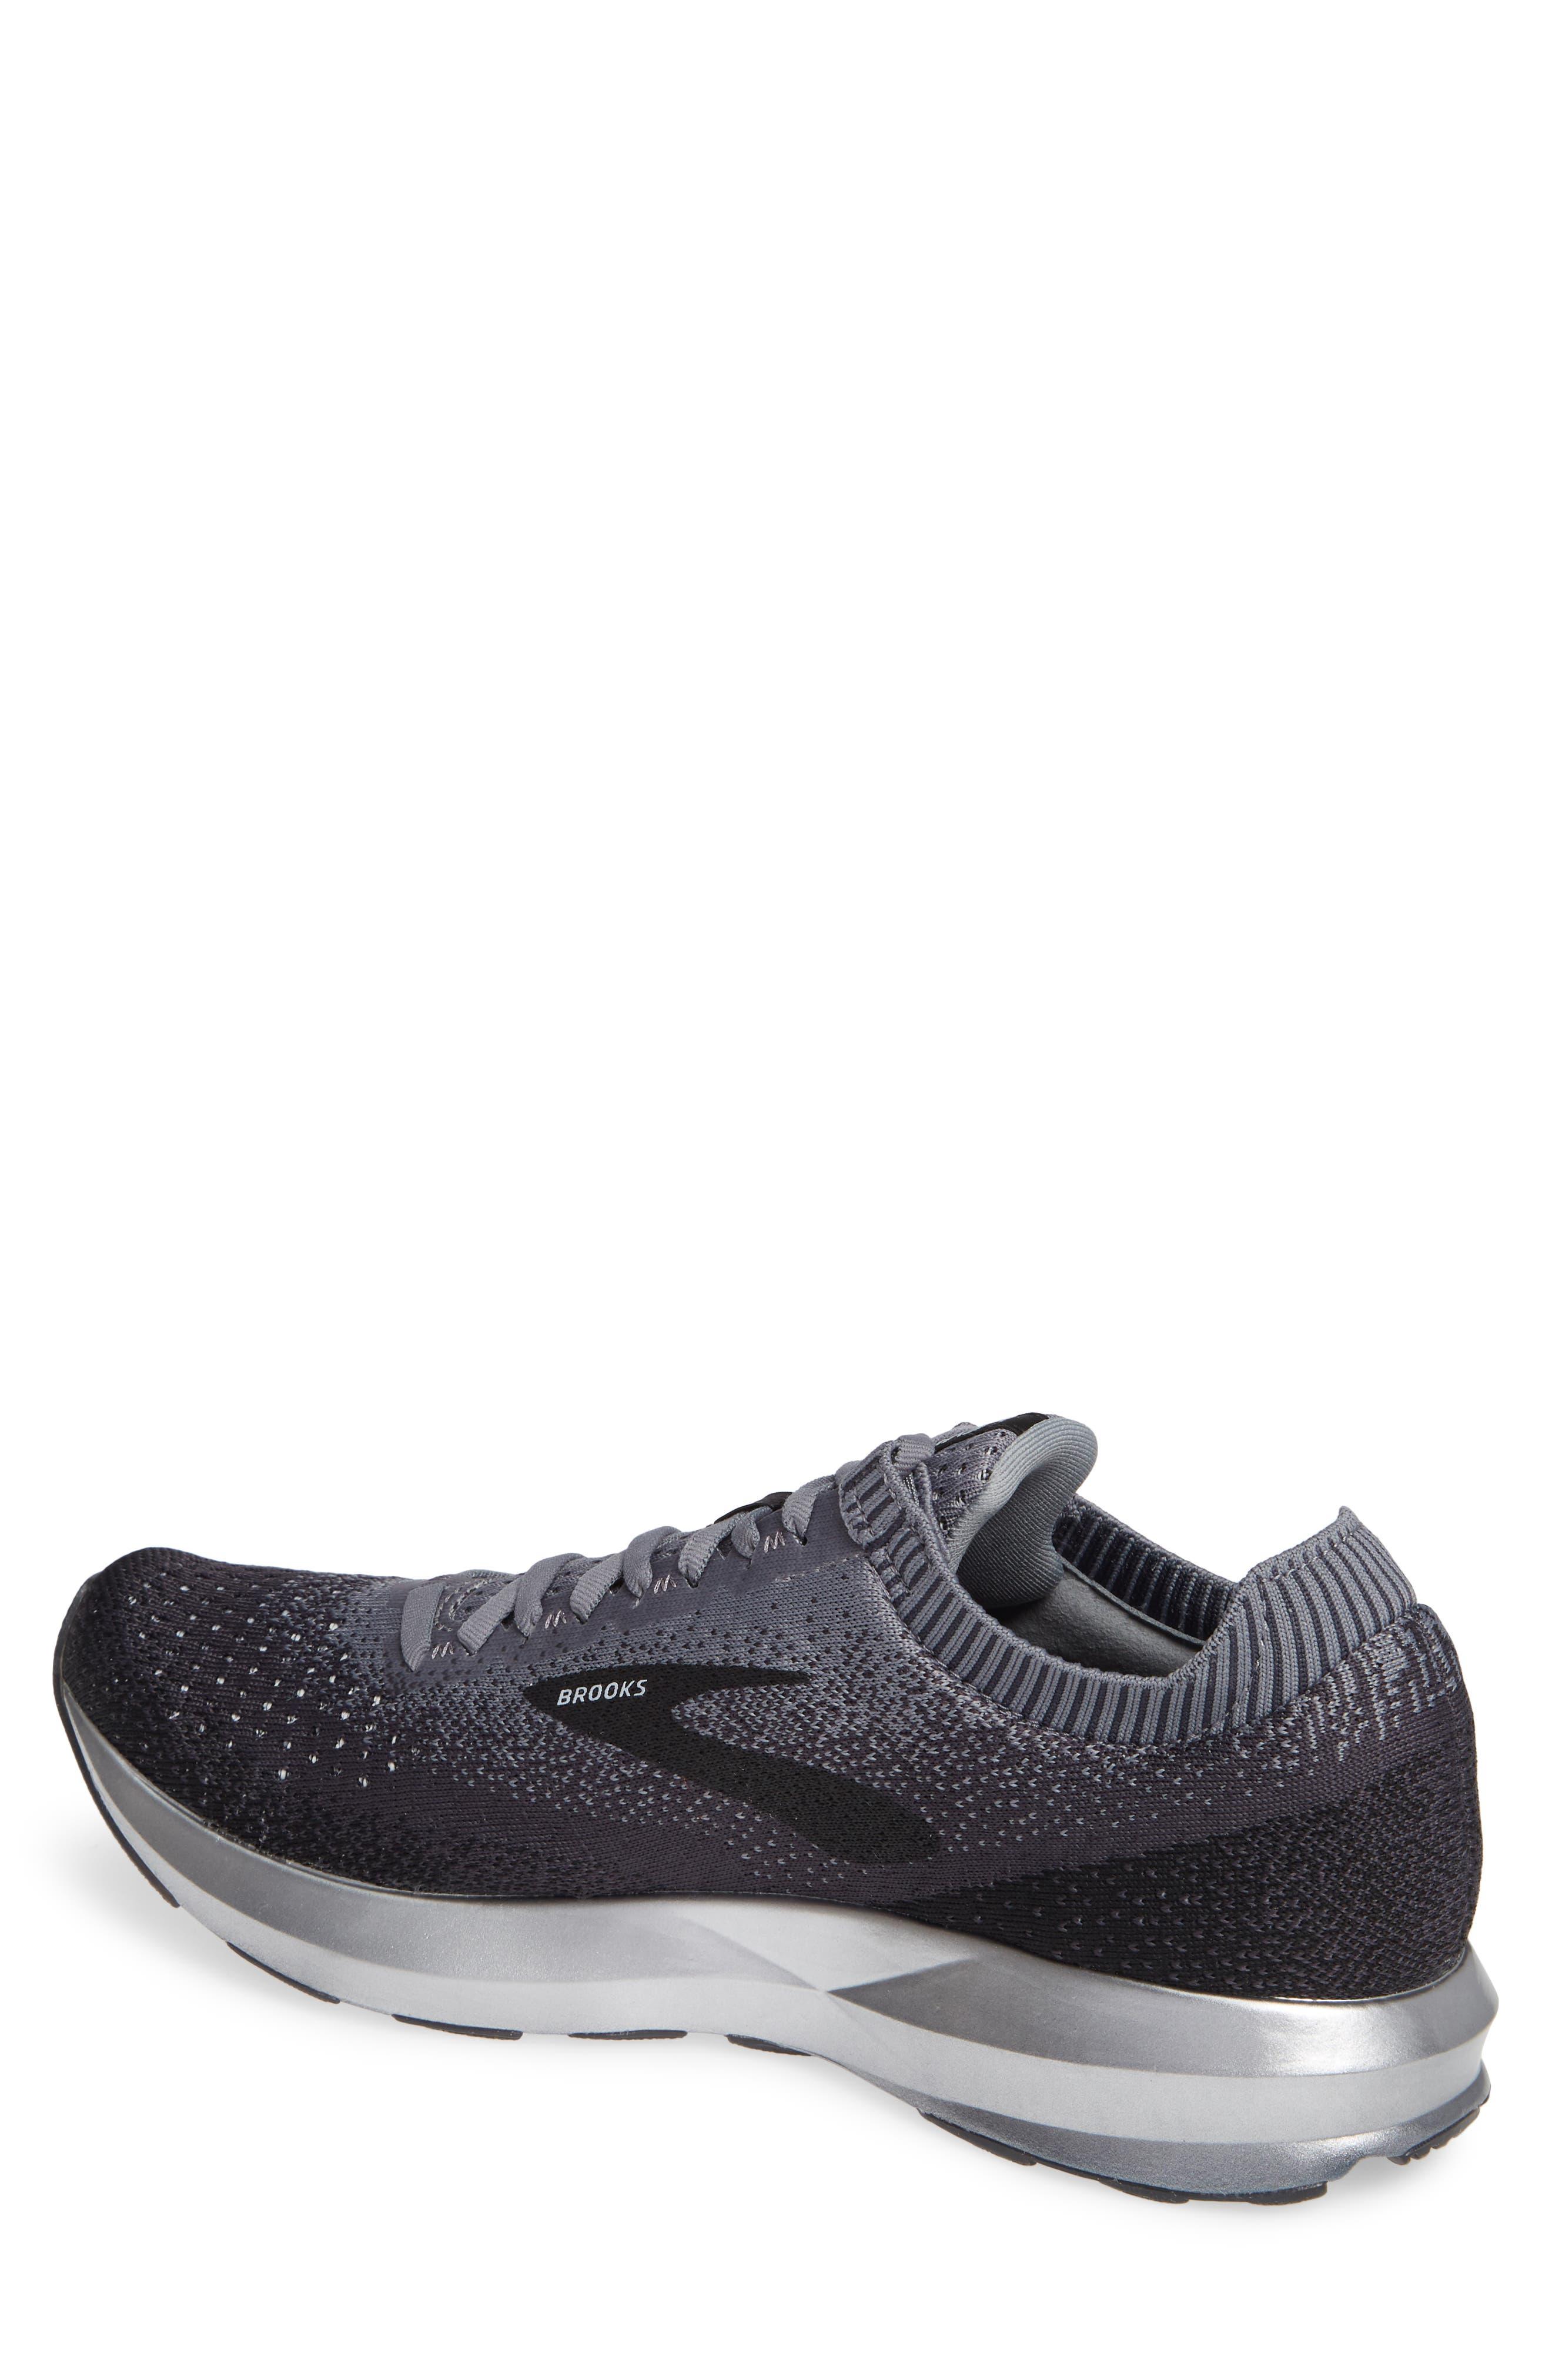 Levitate 2 Running Shoe,                             Alternate thumbnail 2, color,                             BLACK/ GREY/ EBONY